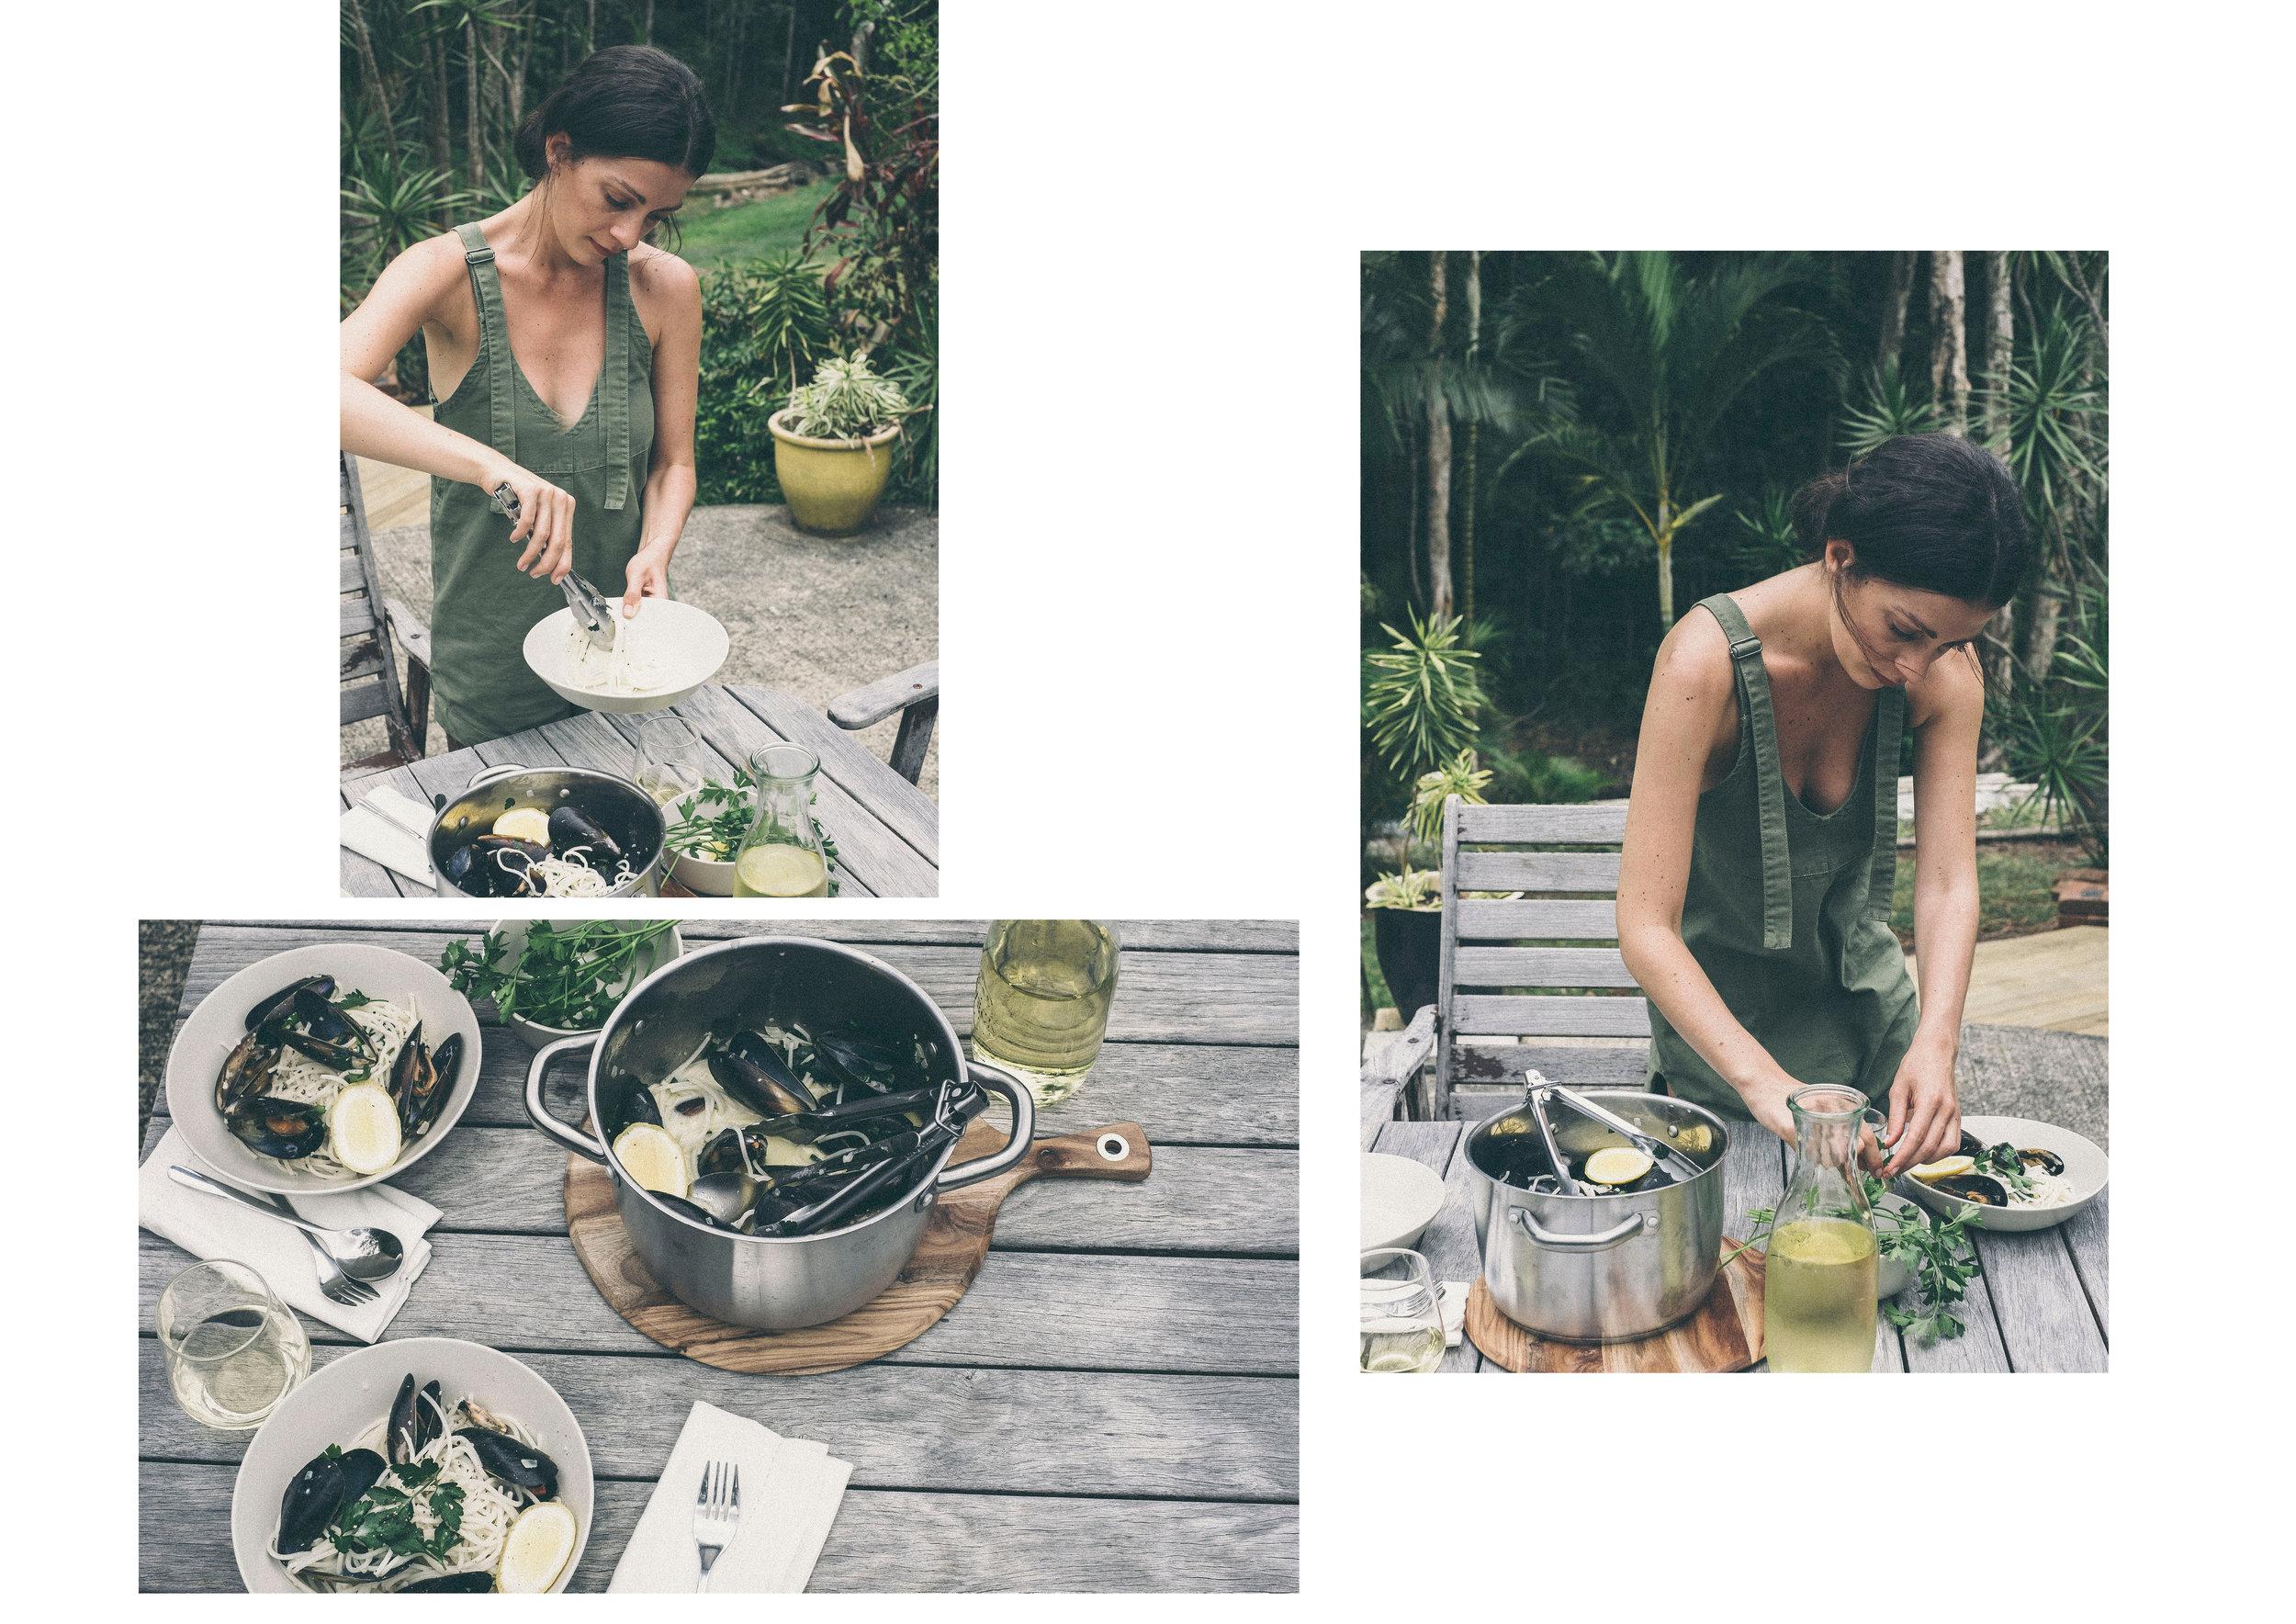 dérrive recipe - creamy moules marinière with quinoa spaghetti www.derrive.com